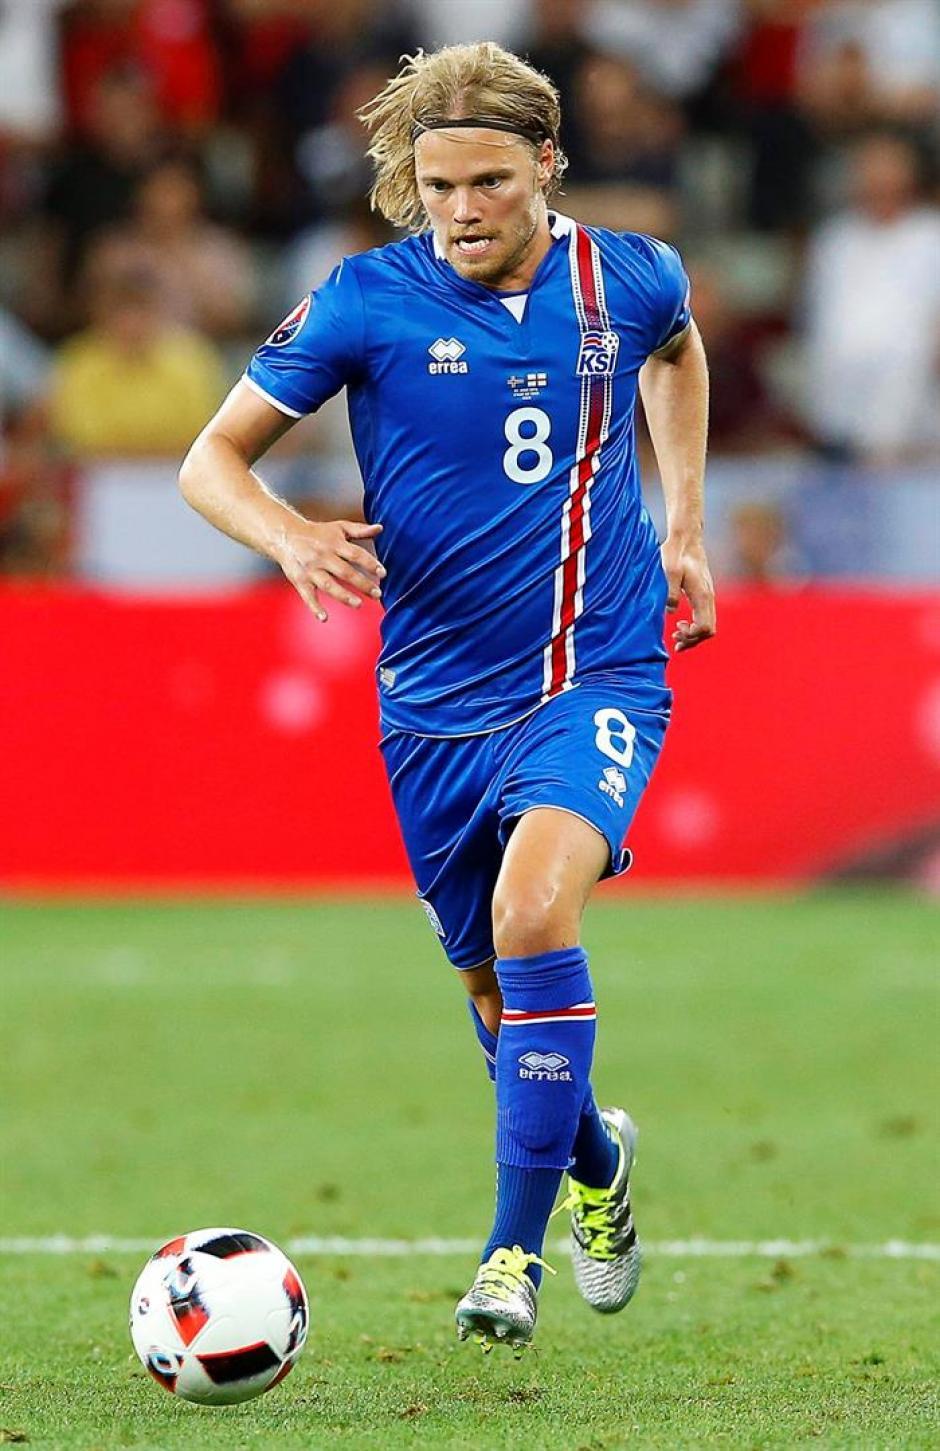 Birkir Bjarnasson, el 'Brad Pitt' del equipo (EFE)